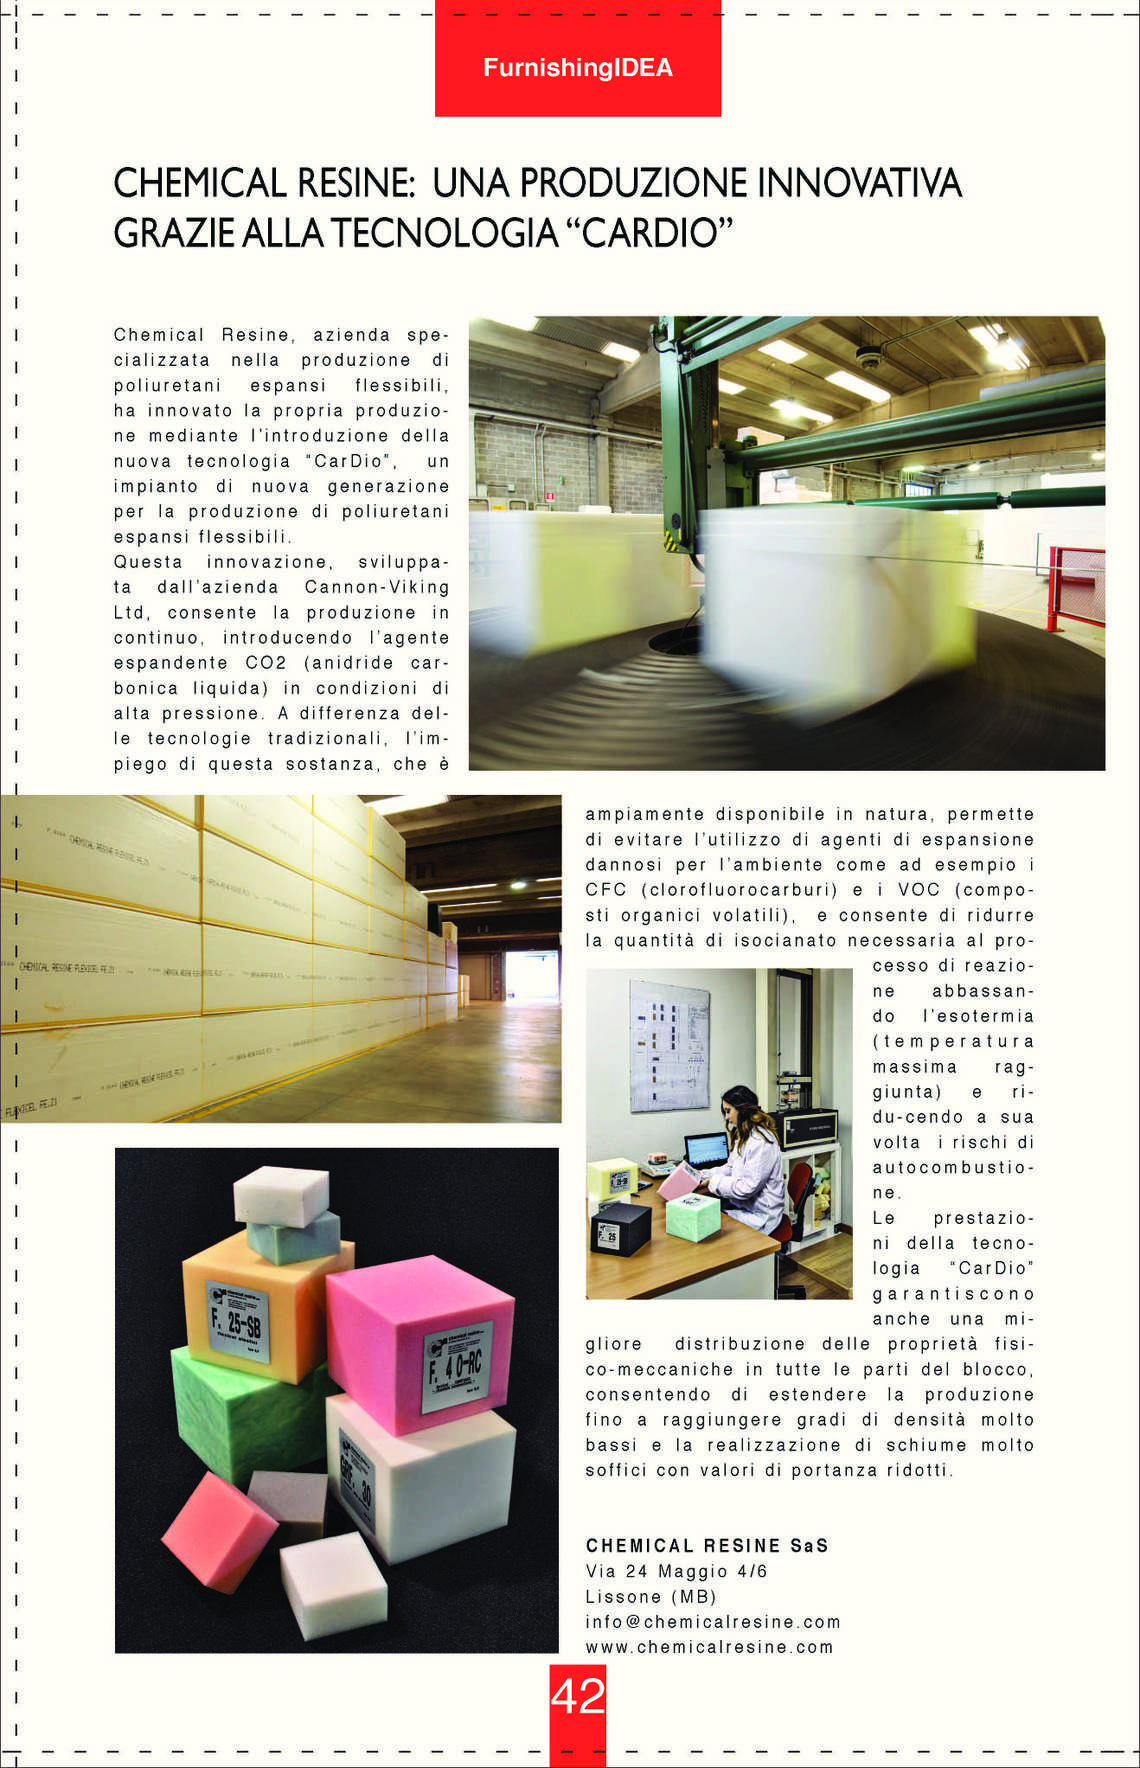 furnishing-idea-journal--1-2018_journal_9_041.jpg